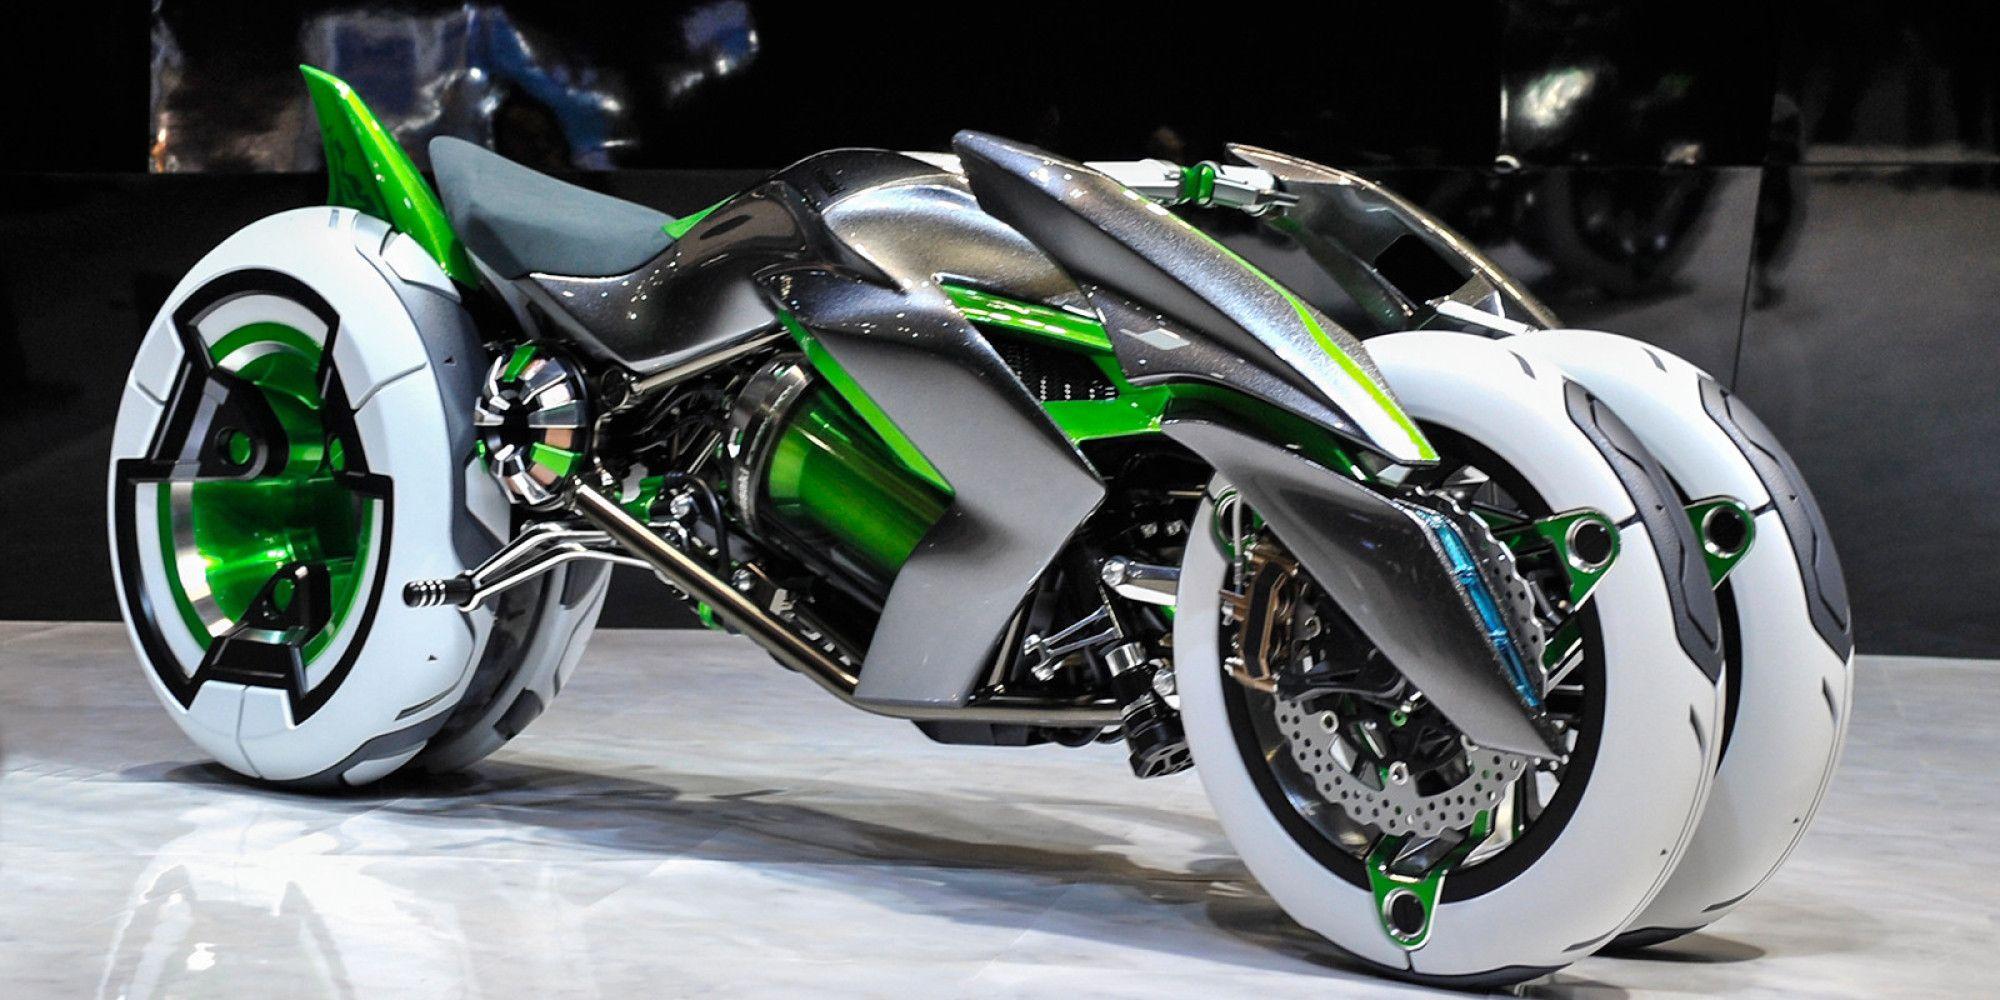 LOOK Kawasaki's New Concept Bike Is Insane Futuristic